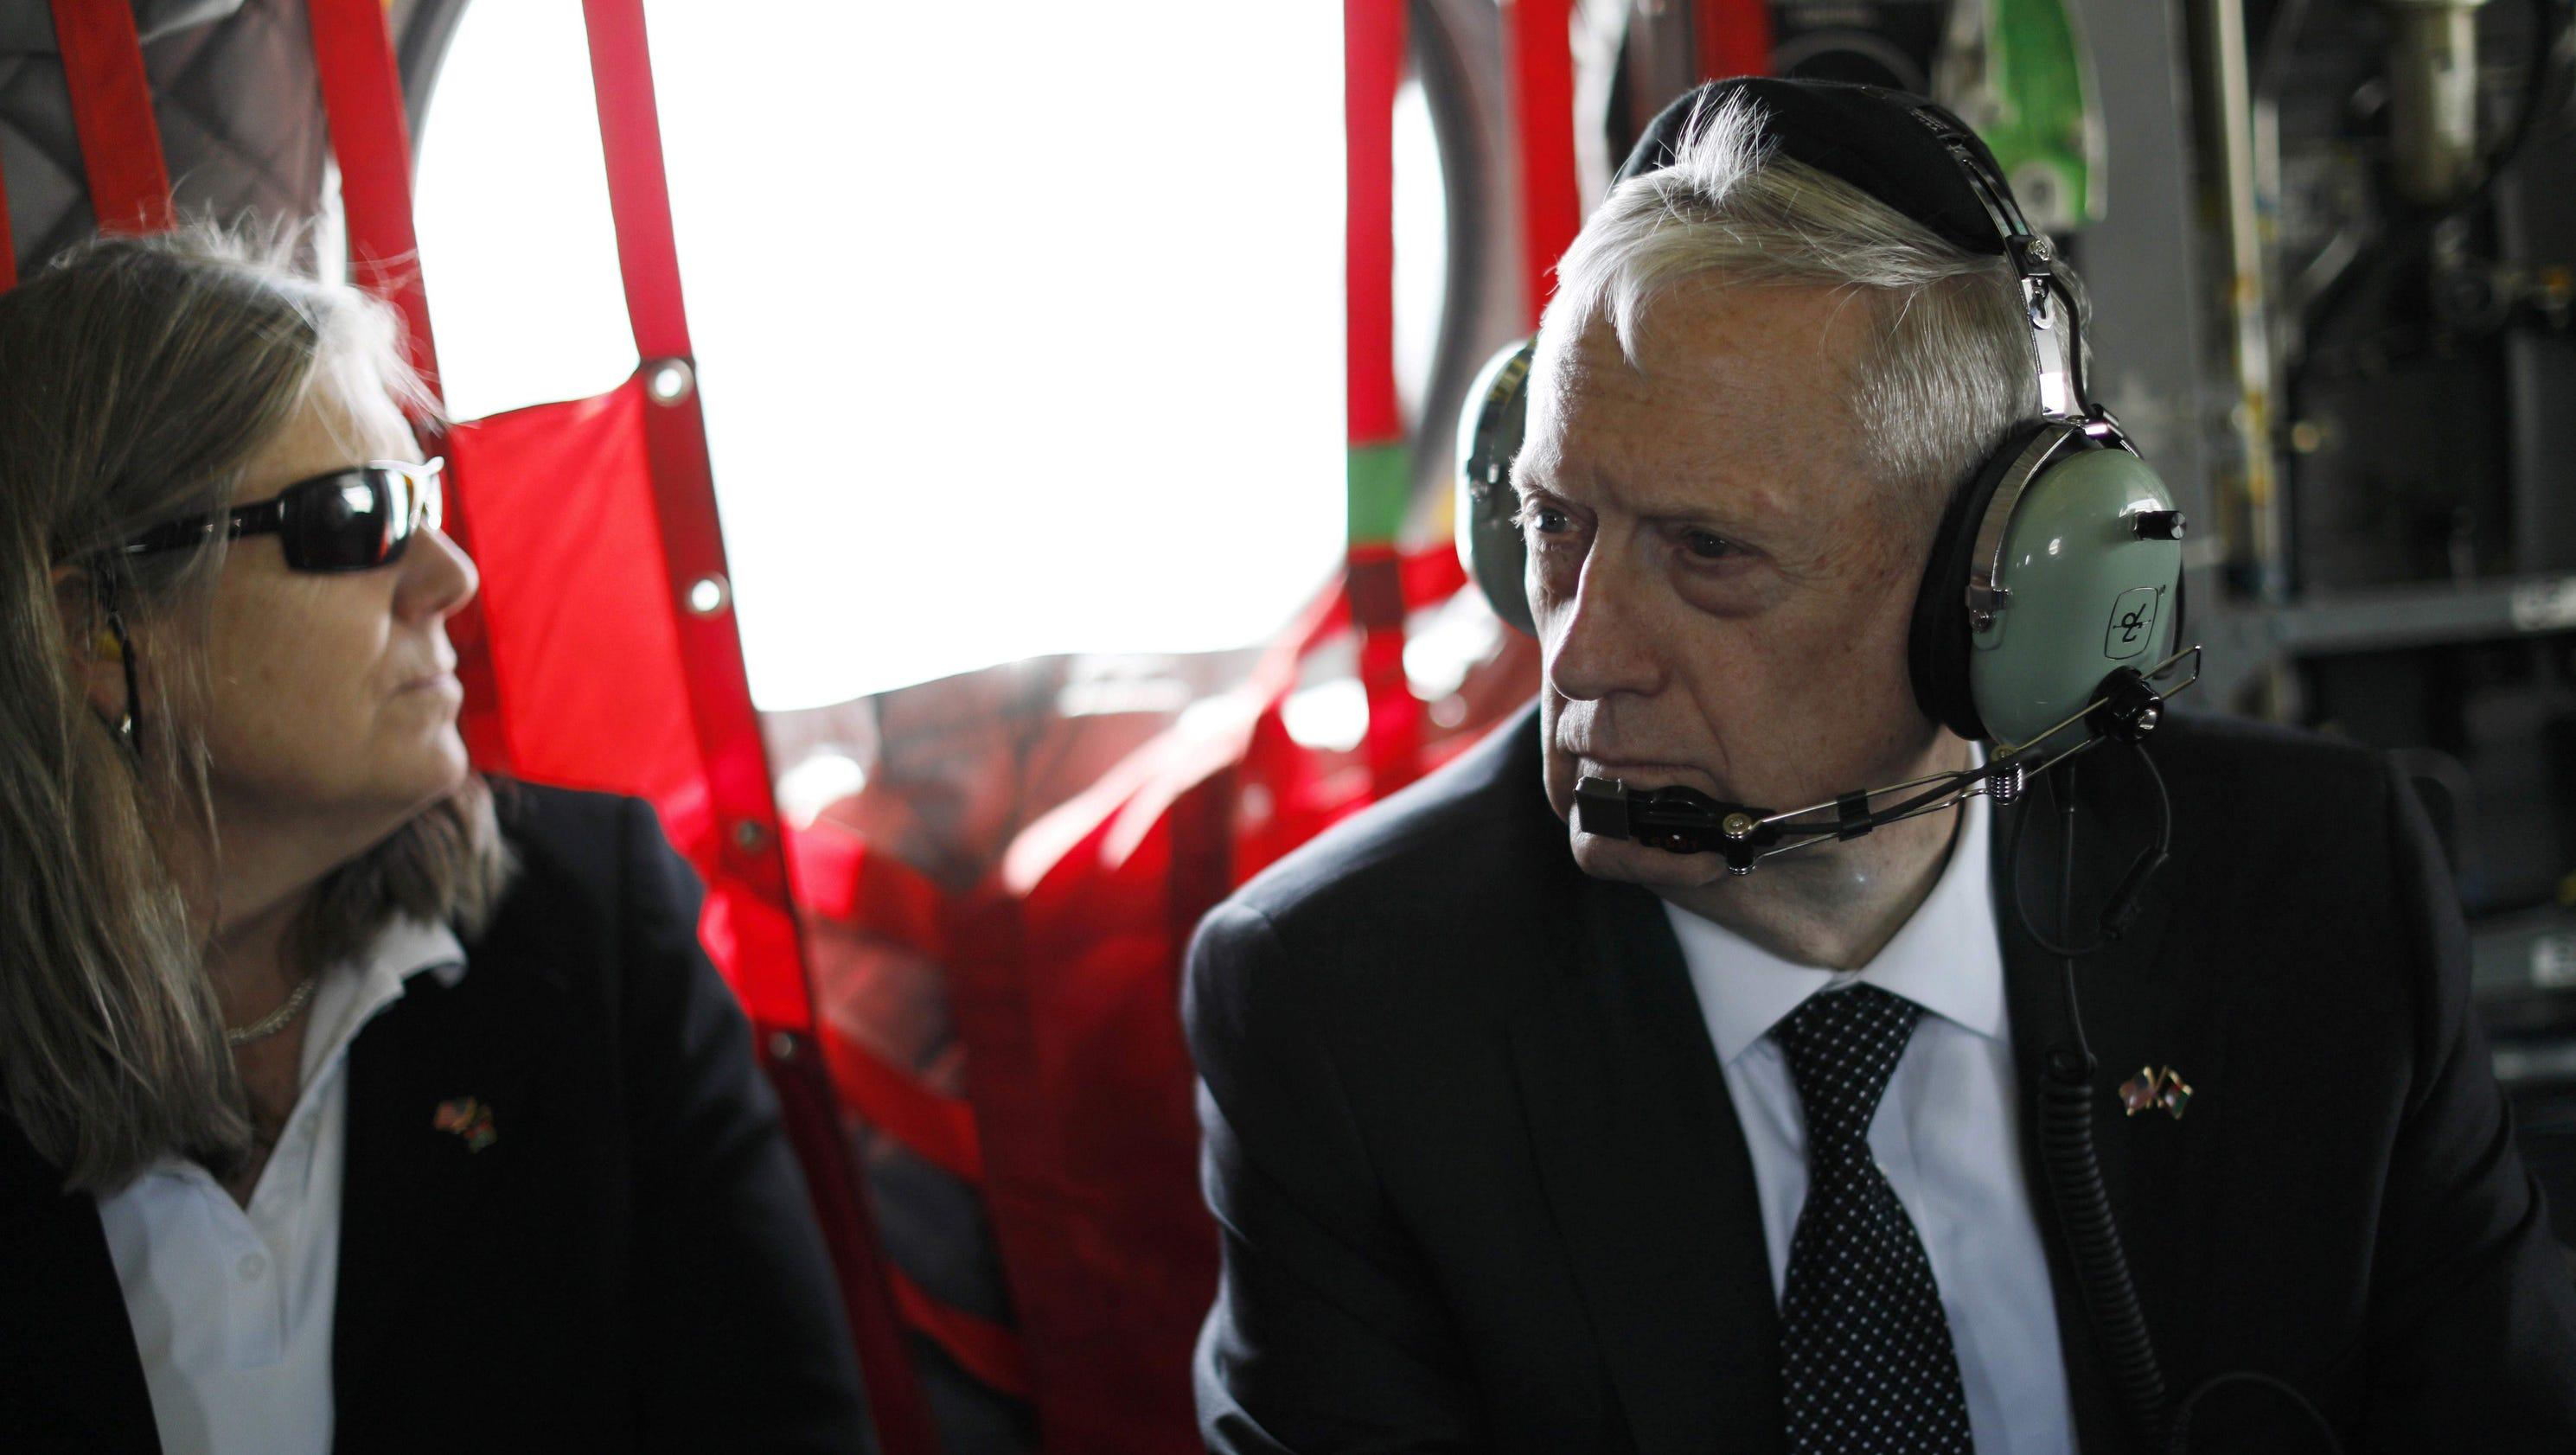 Mattis: U.S., NATO must confront Russia on Taliban after major attack